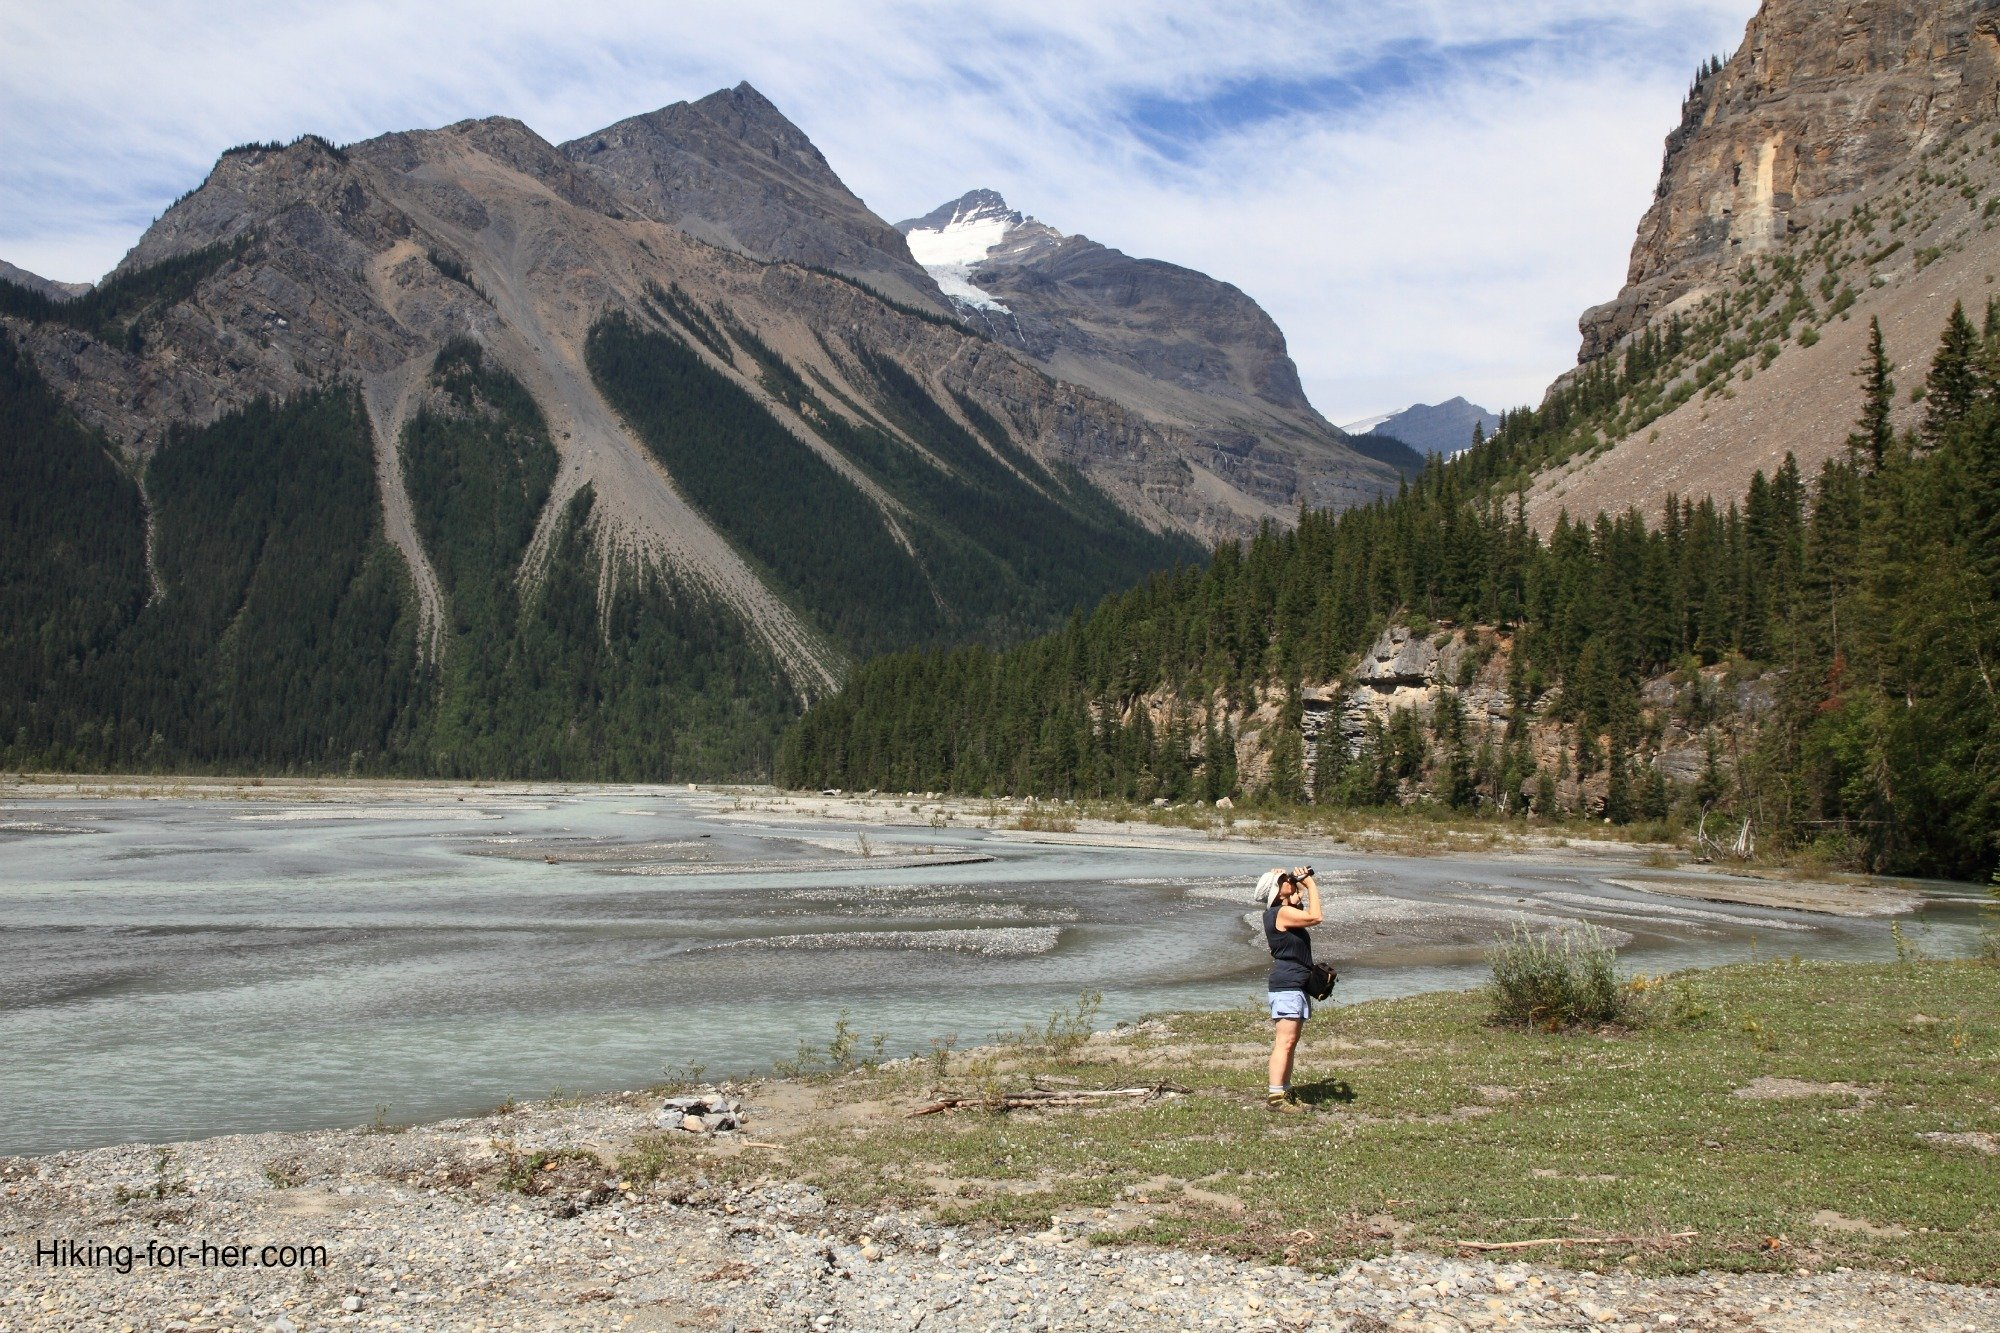 Hiker at the edge of a mountain lake, gazing upward at the peaks